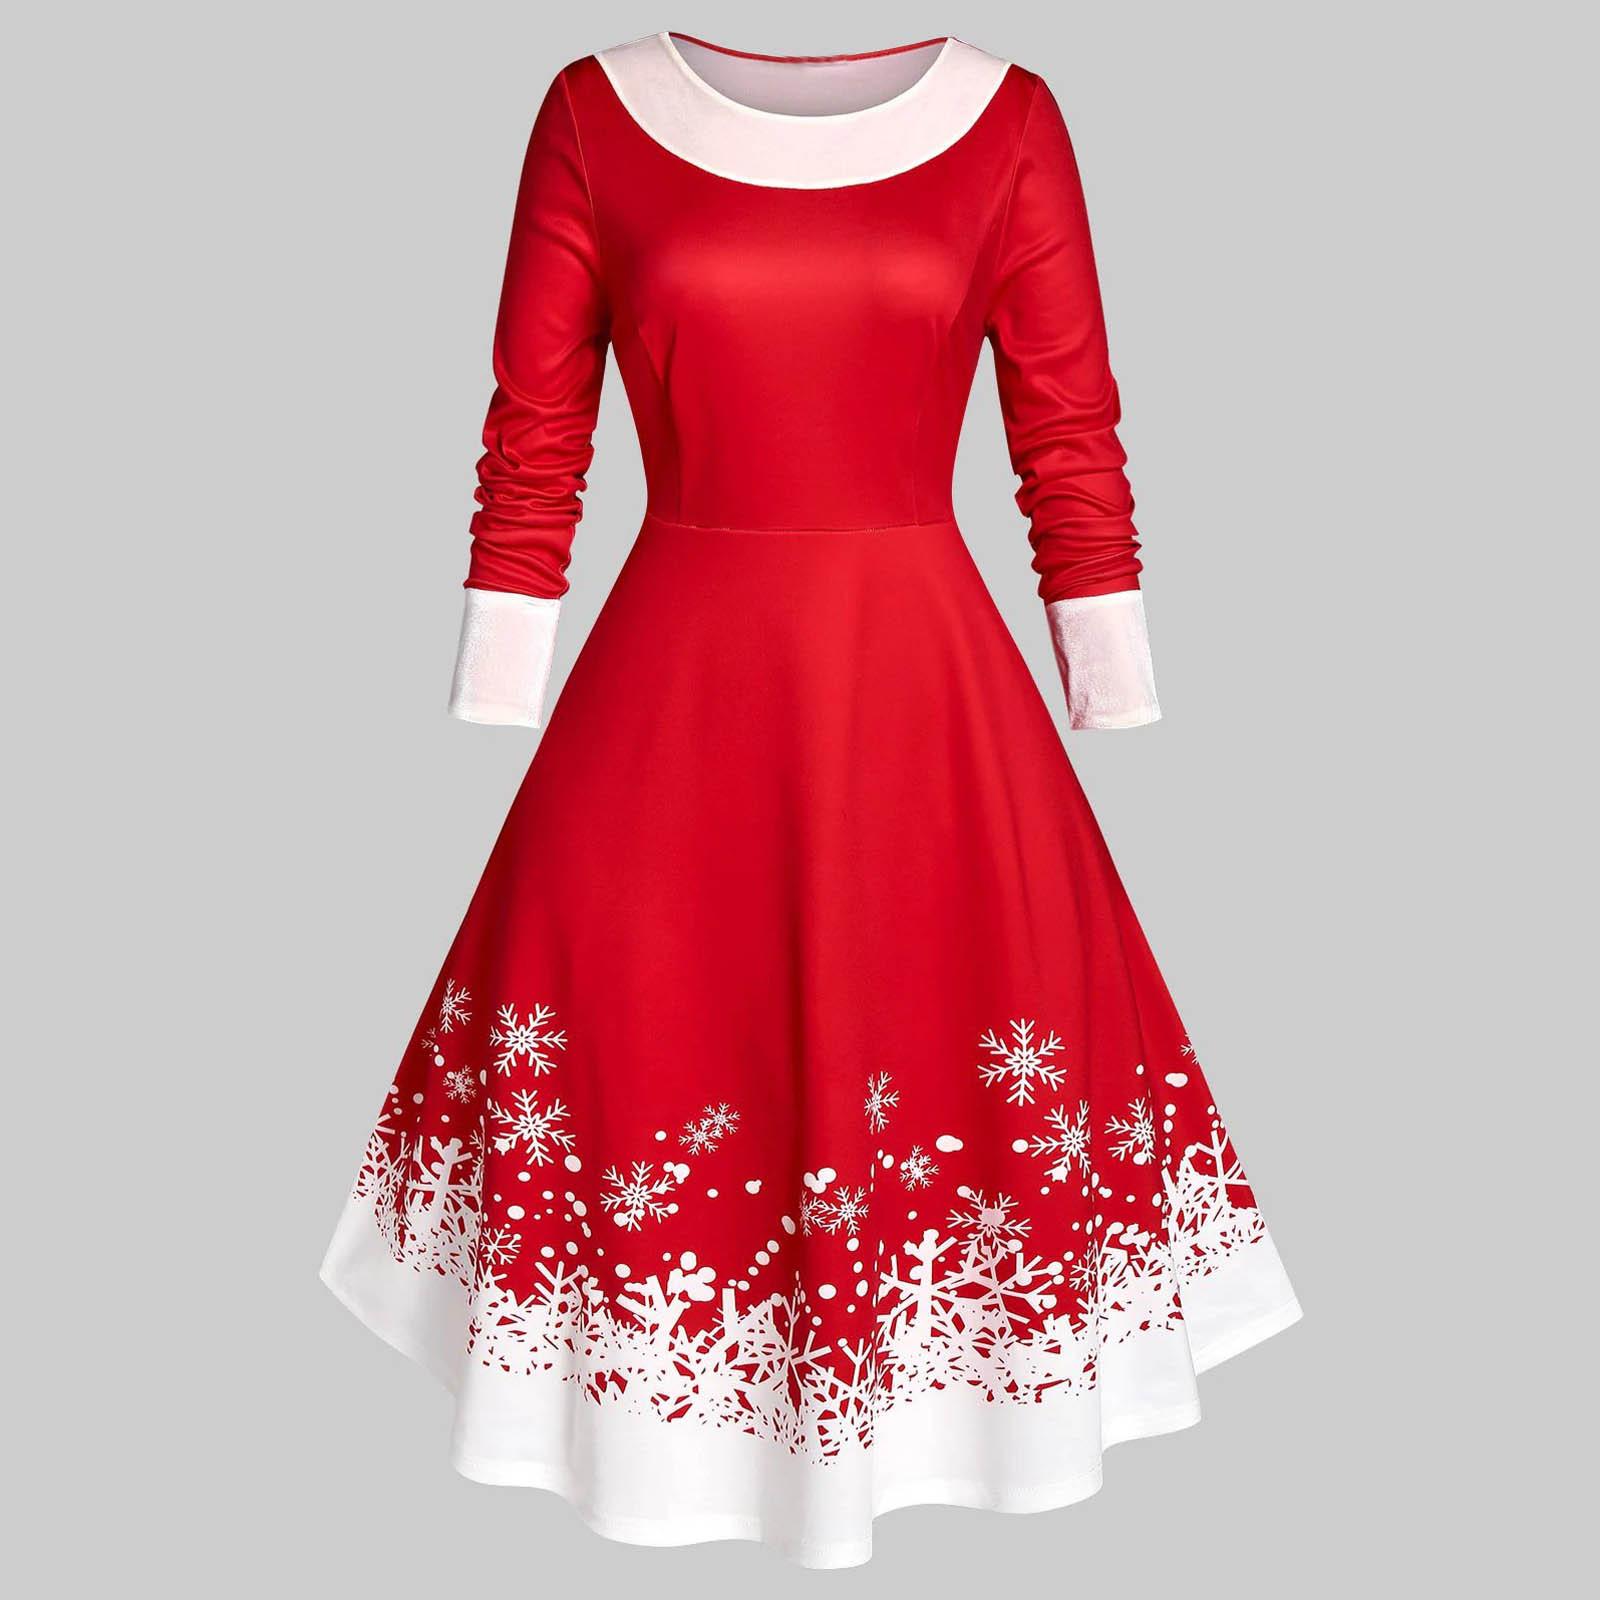 4# christmas 2020 Dresses Plus Size Women Vintage Christmas Snowflake Print Velvet Party Long Sleeve Dress vestidos de fiesta